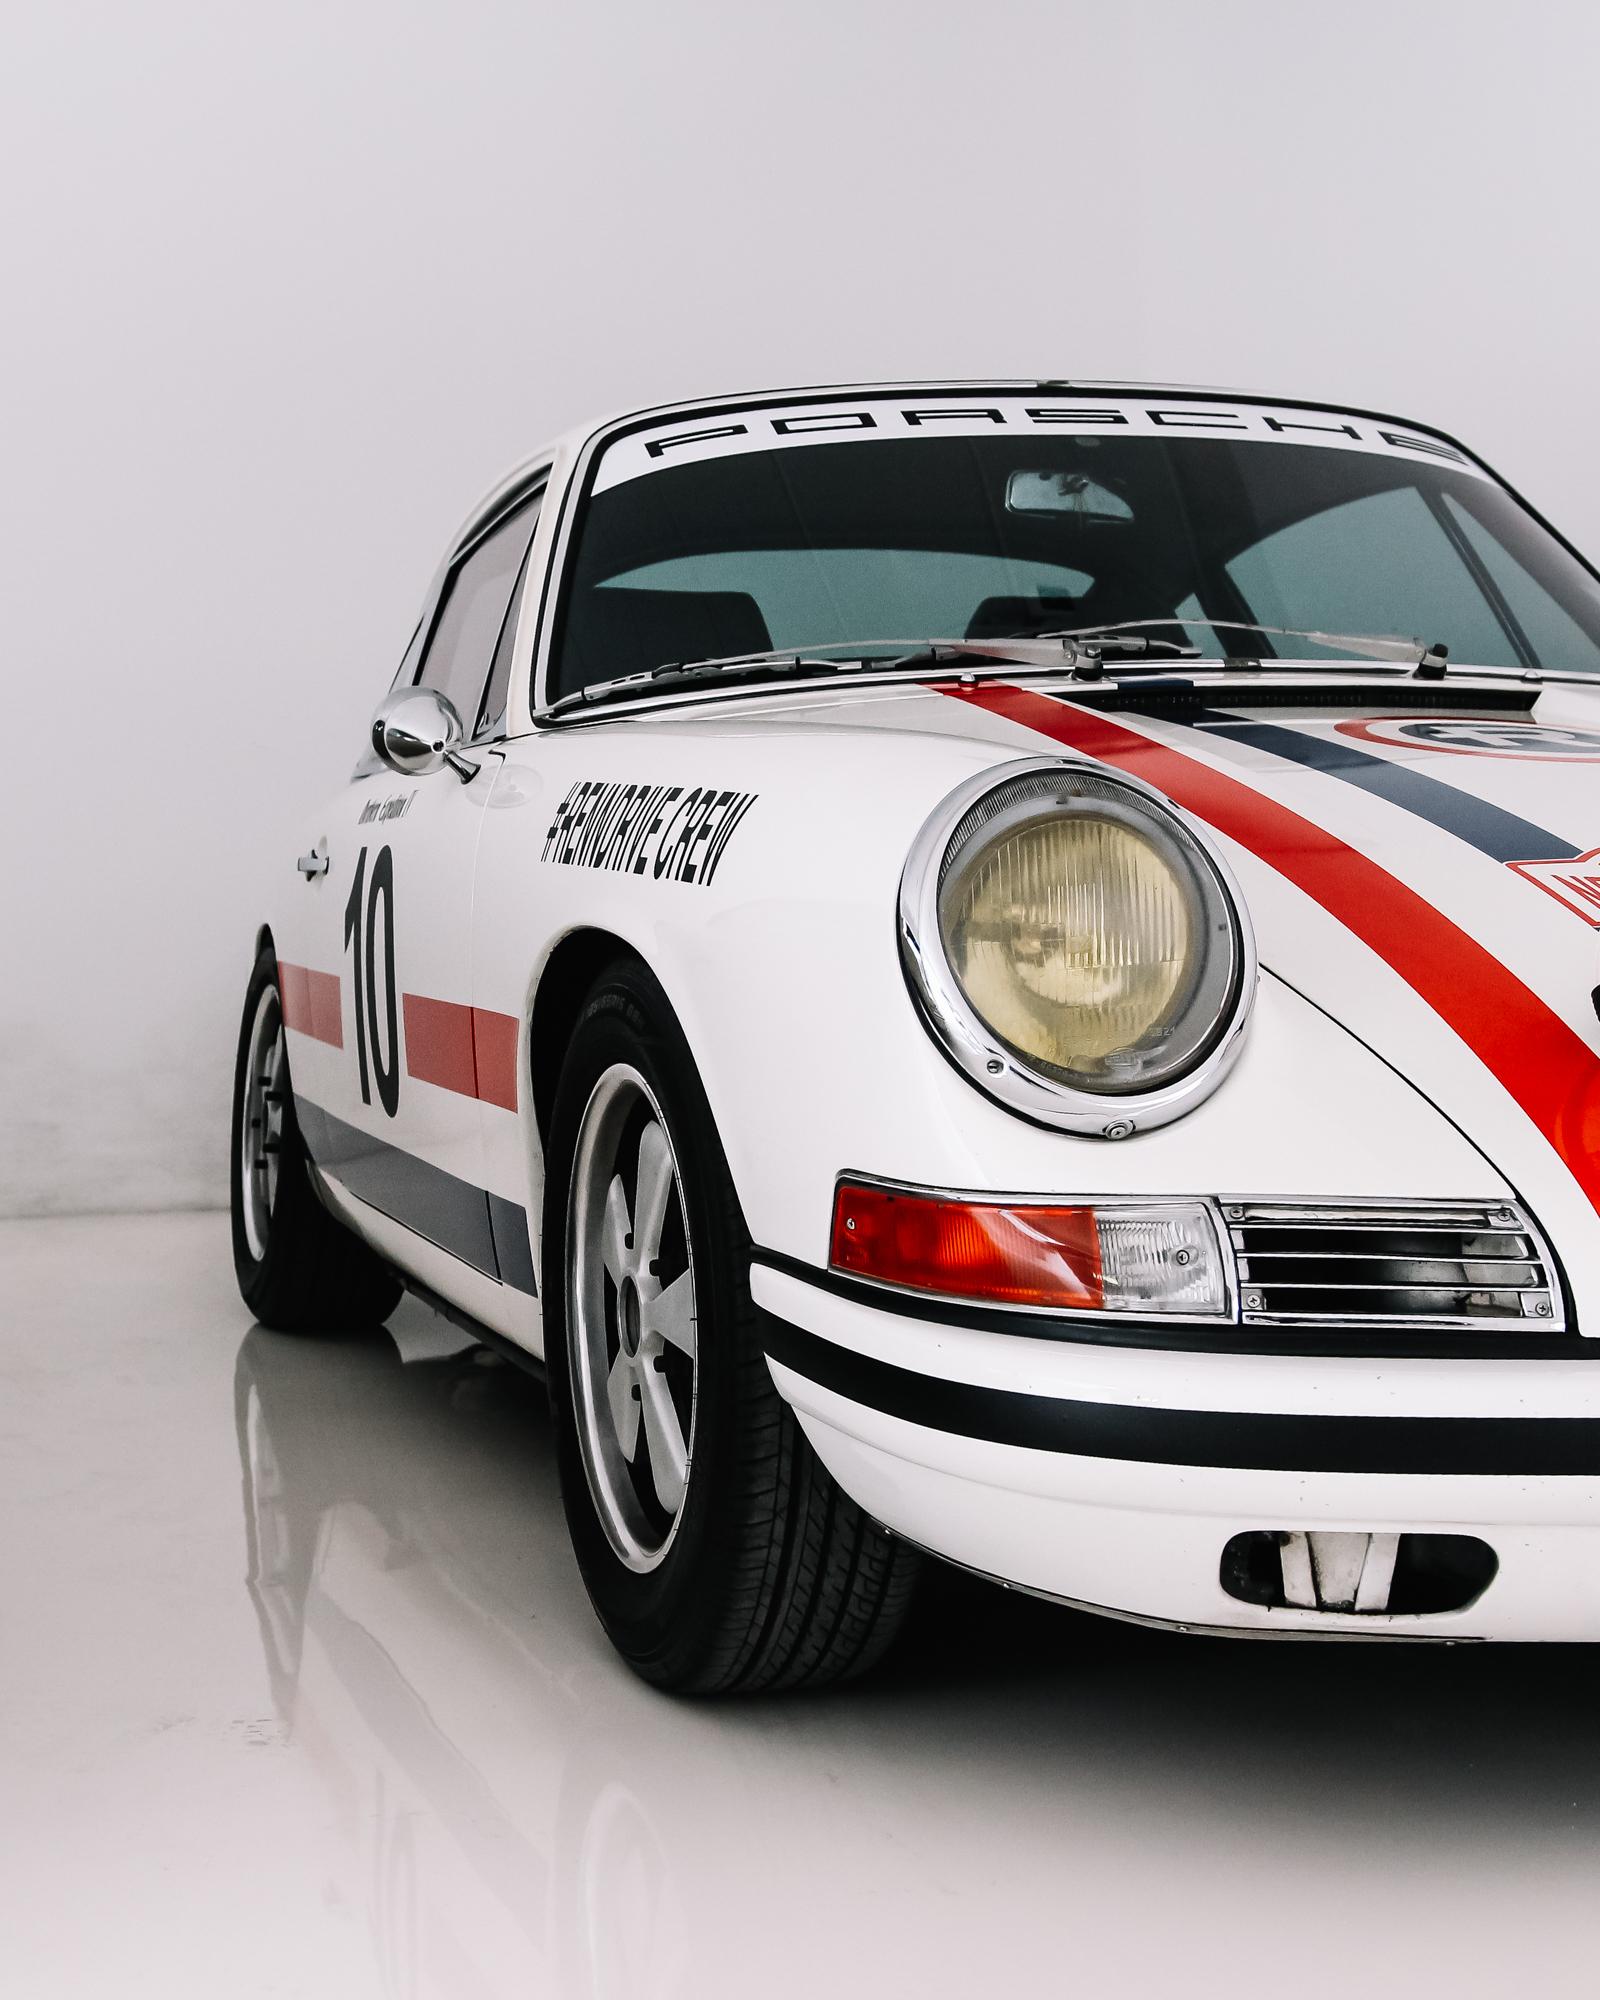 TeensterPorscheHouse100 Cozy Prix D'une Porsche 911 Gt1 Cars Trend